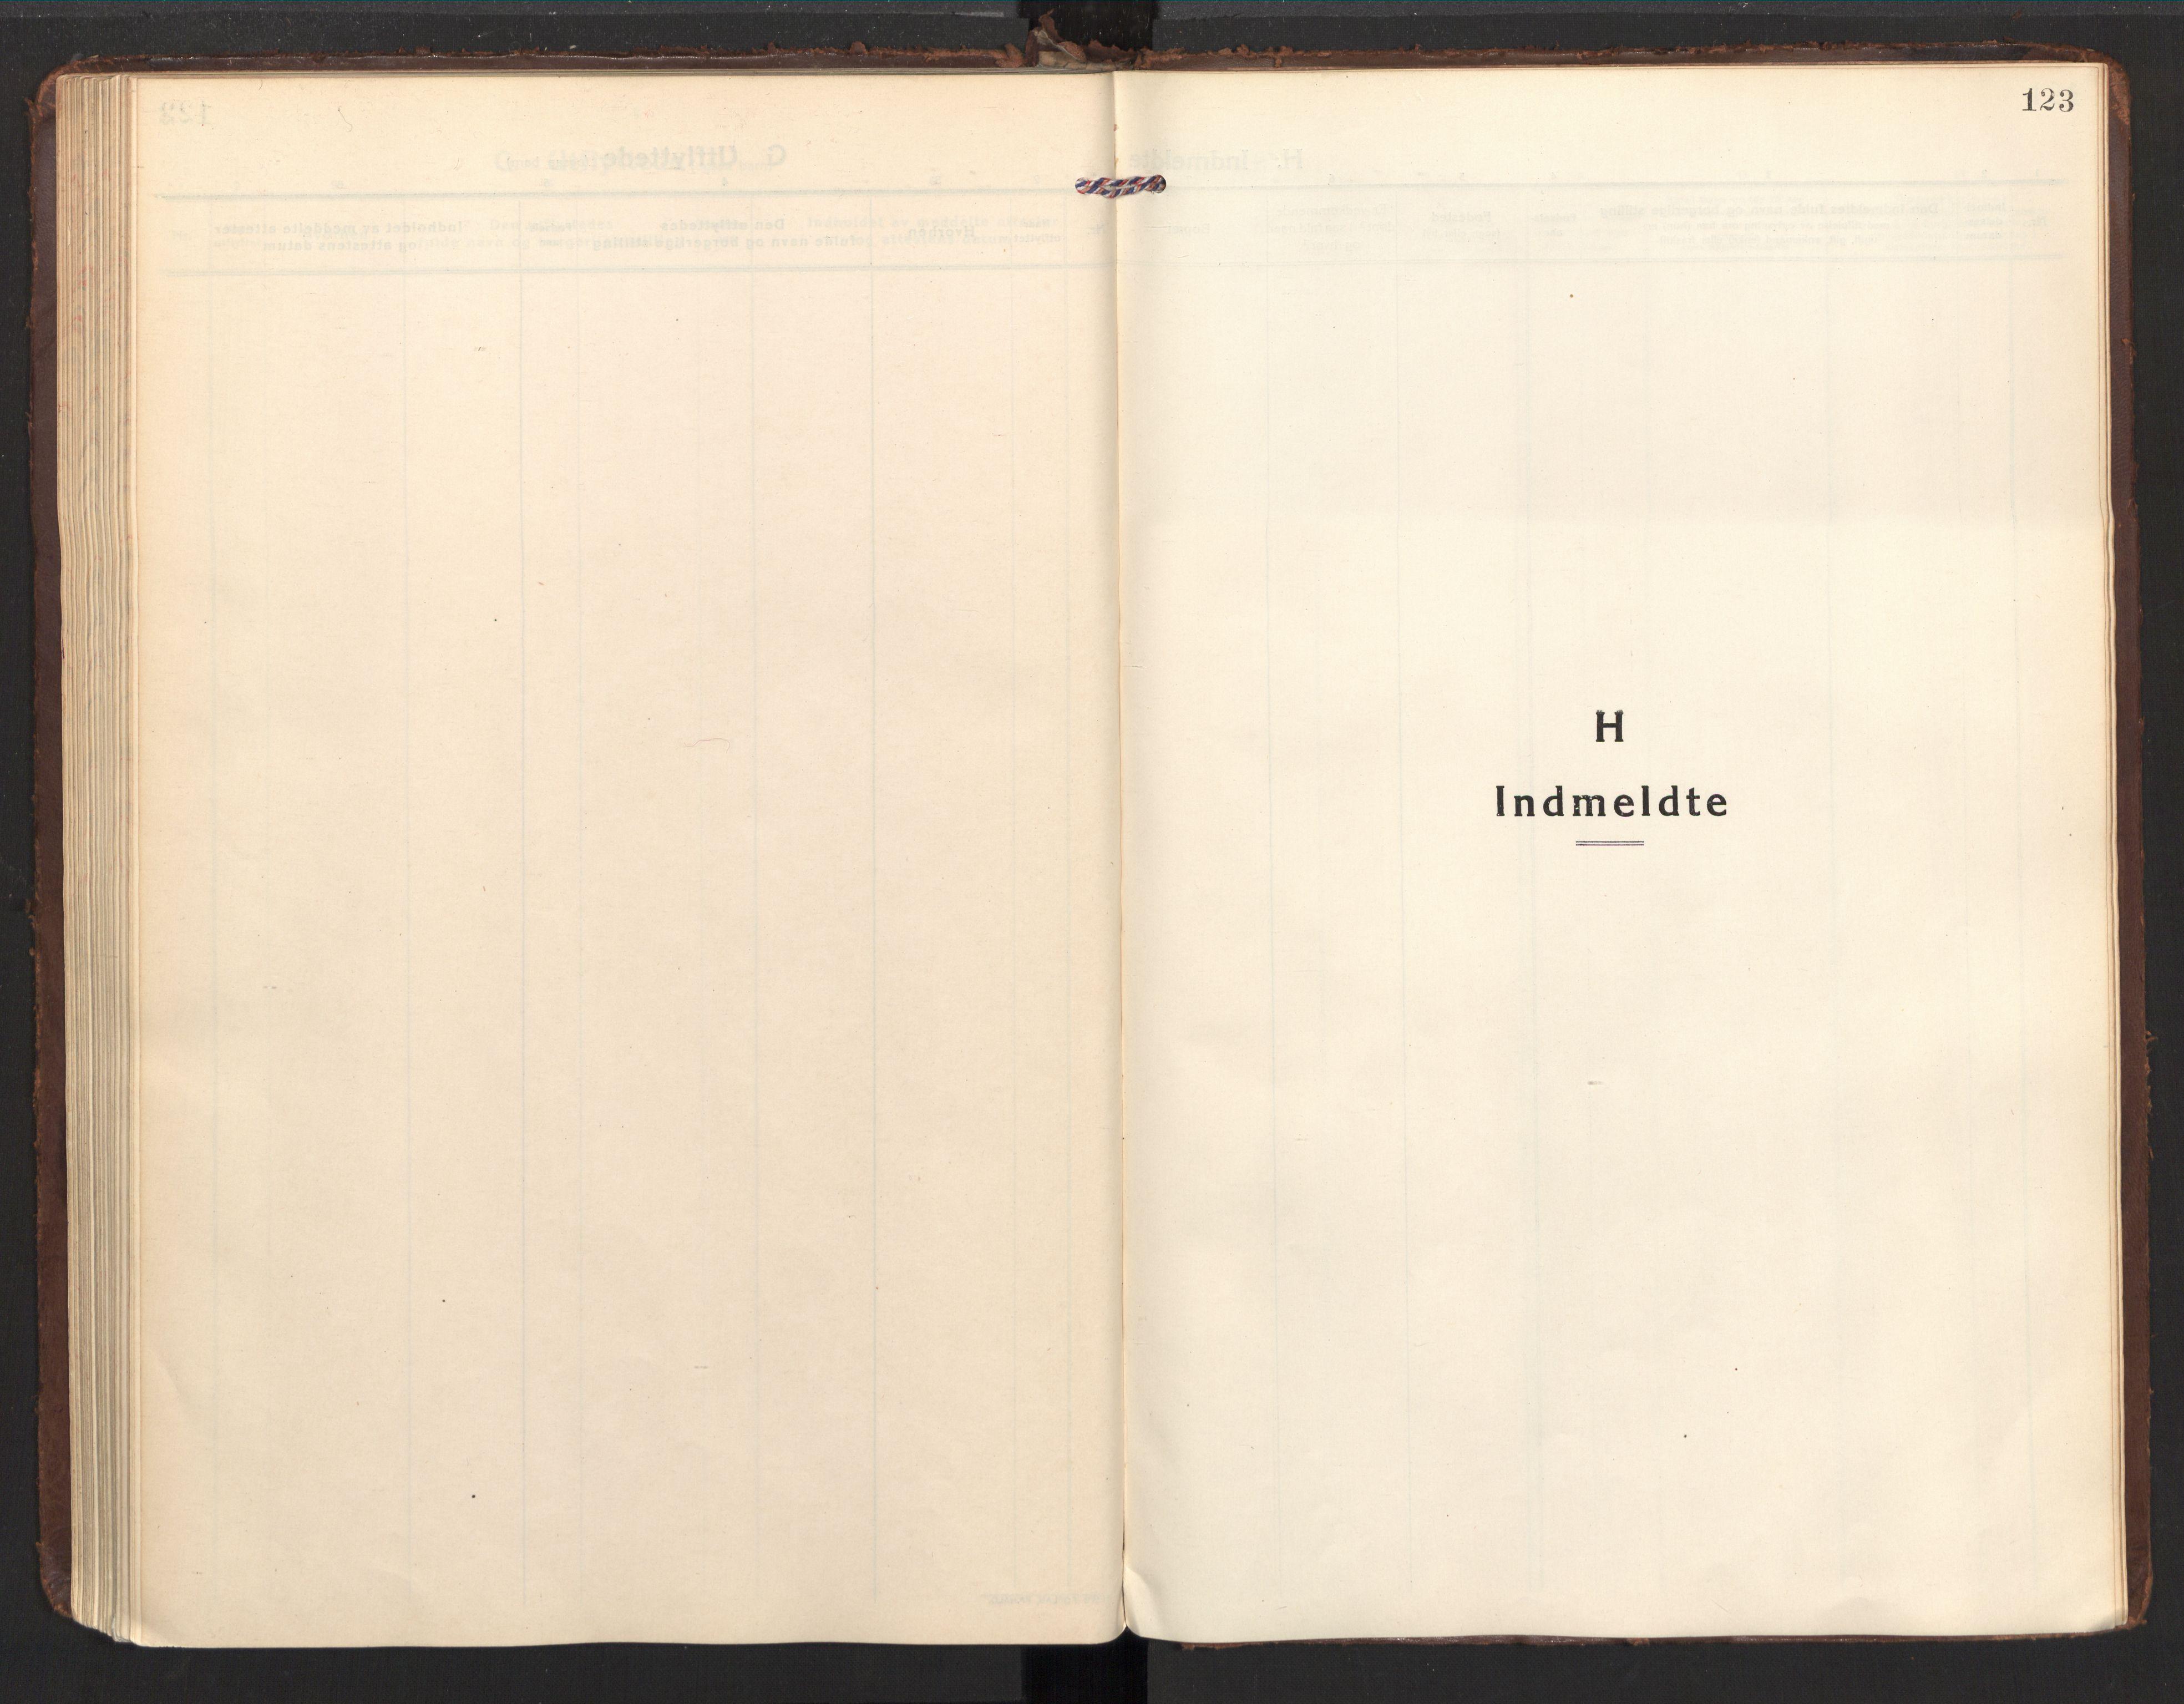 SAT, Ministerialprotokoller, klokkerbøker og fødselsregistre - Nordland, 857/L0825: Ministerialbok nr. 857A05, 1917-1946, s. 123